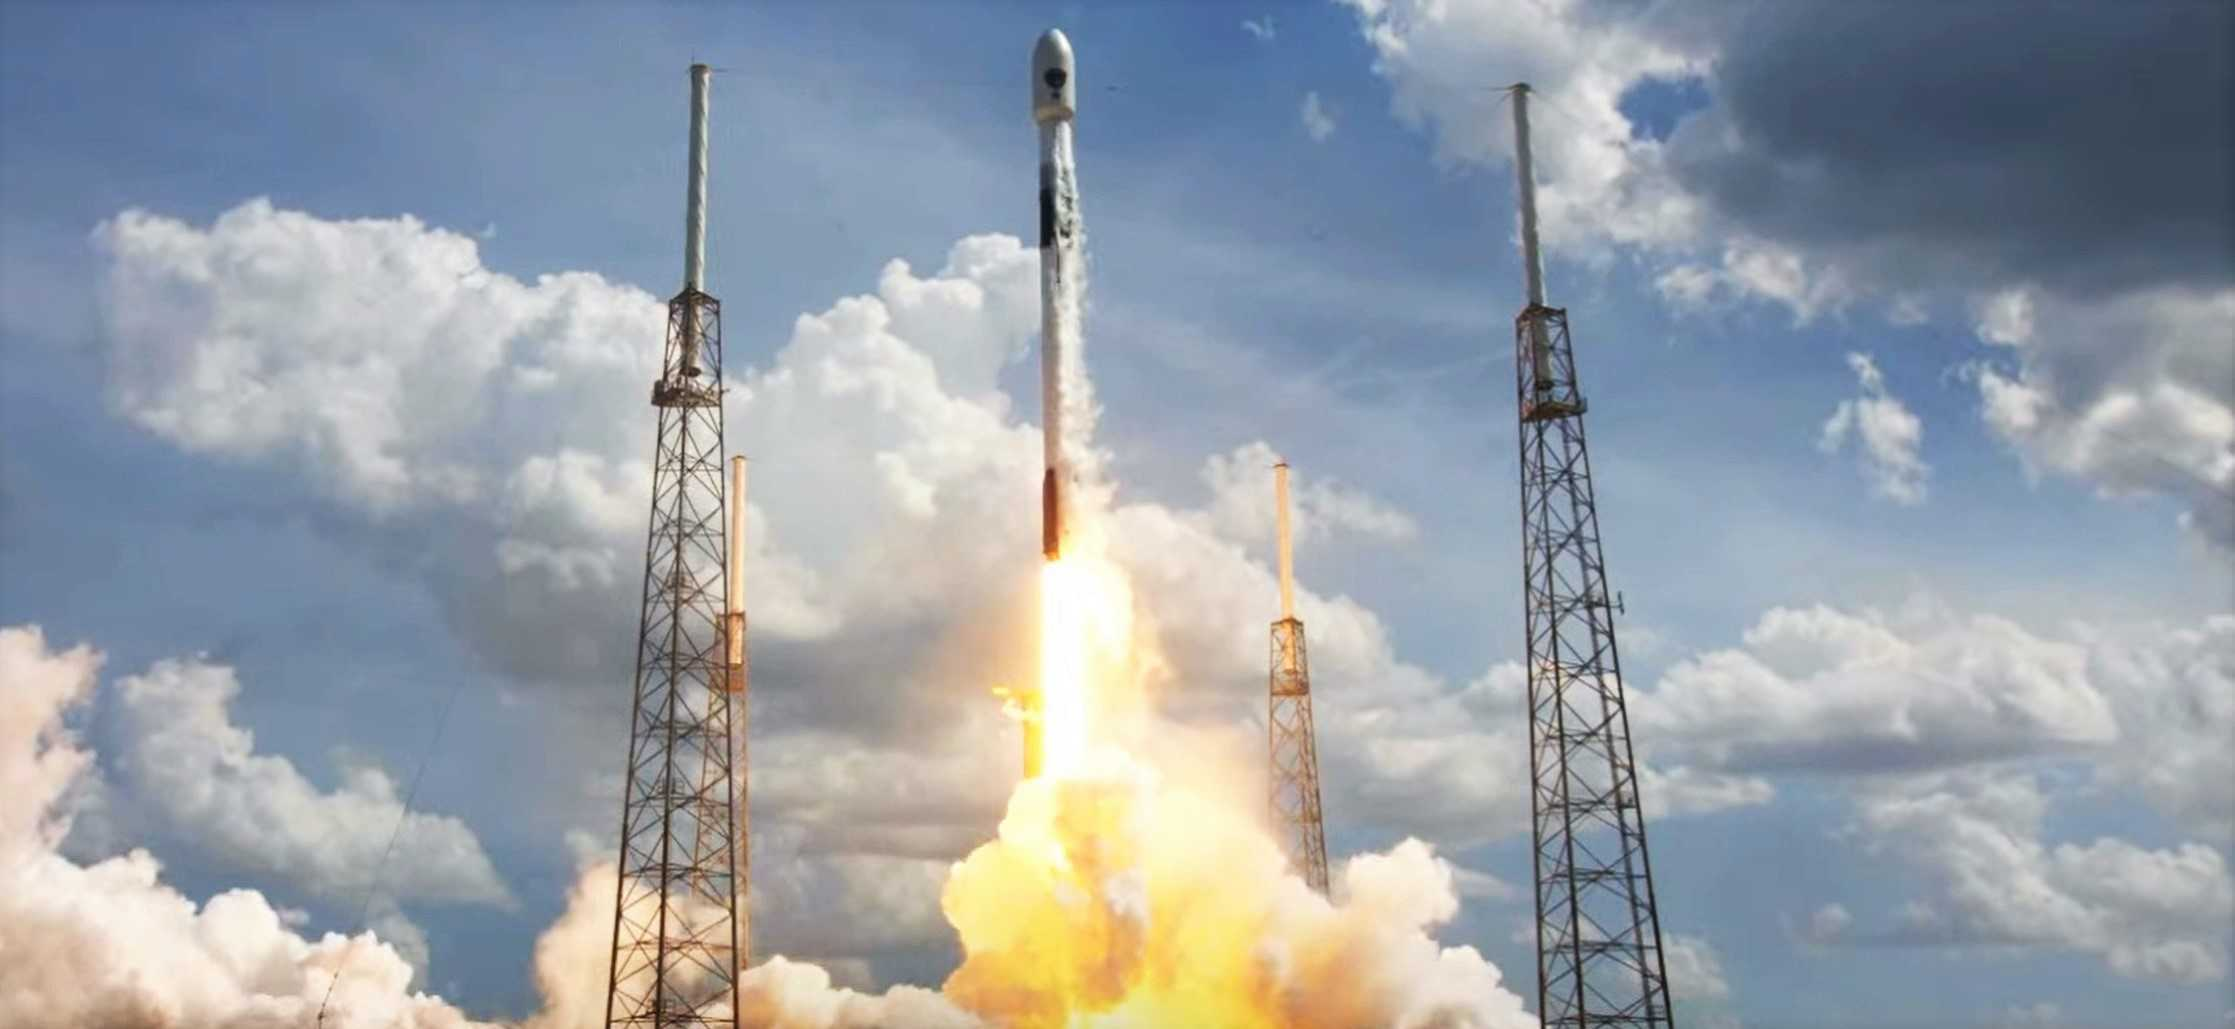 GPS III SV03 Falcon 9 B1060 webcast 063020 (SpaceX) 4 (c)